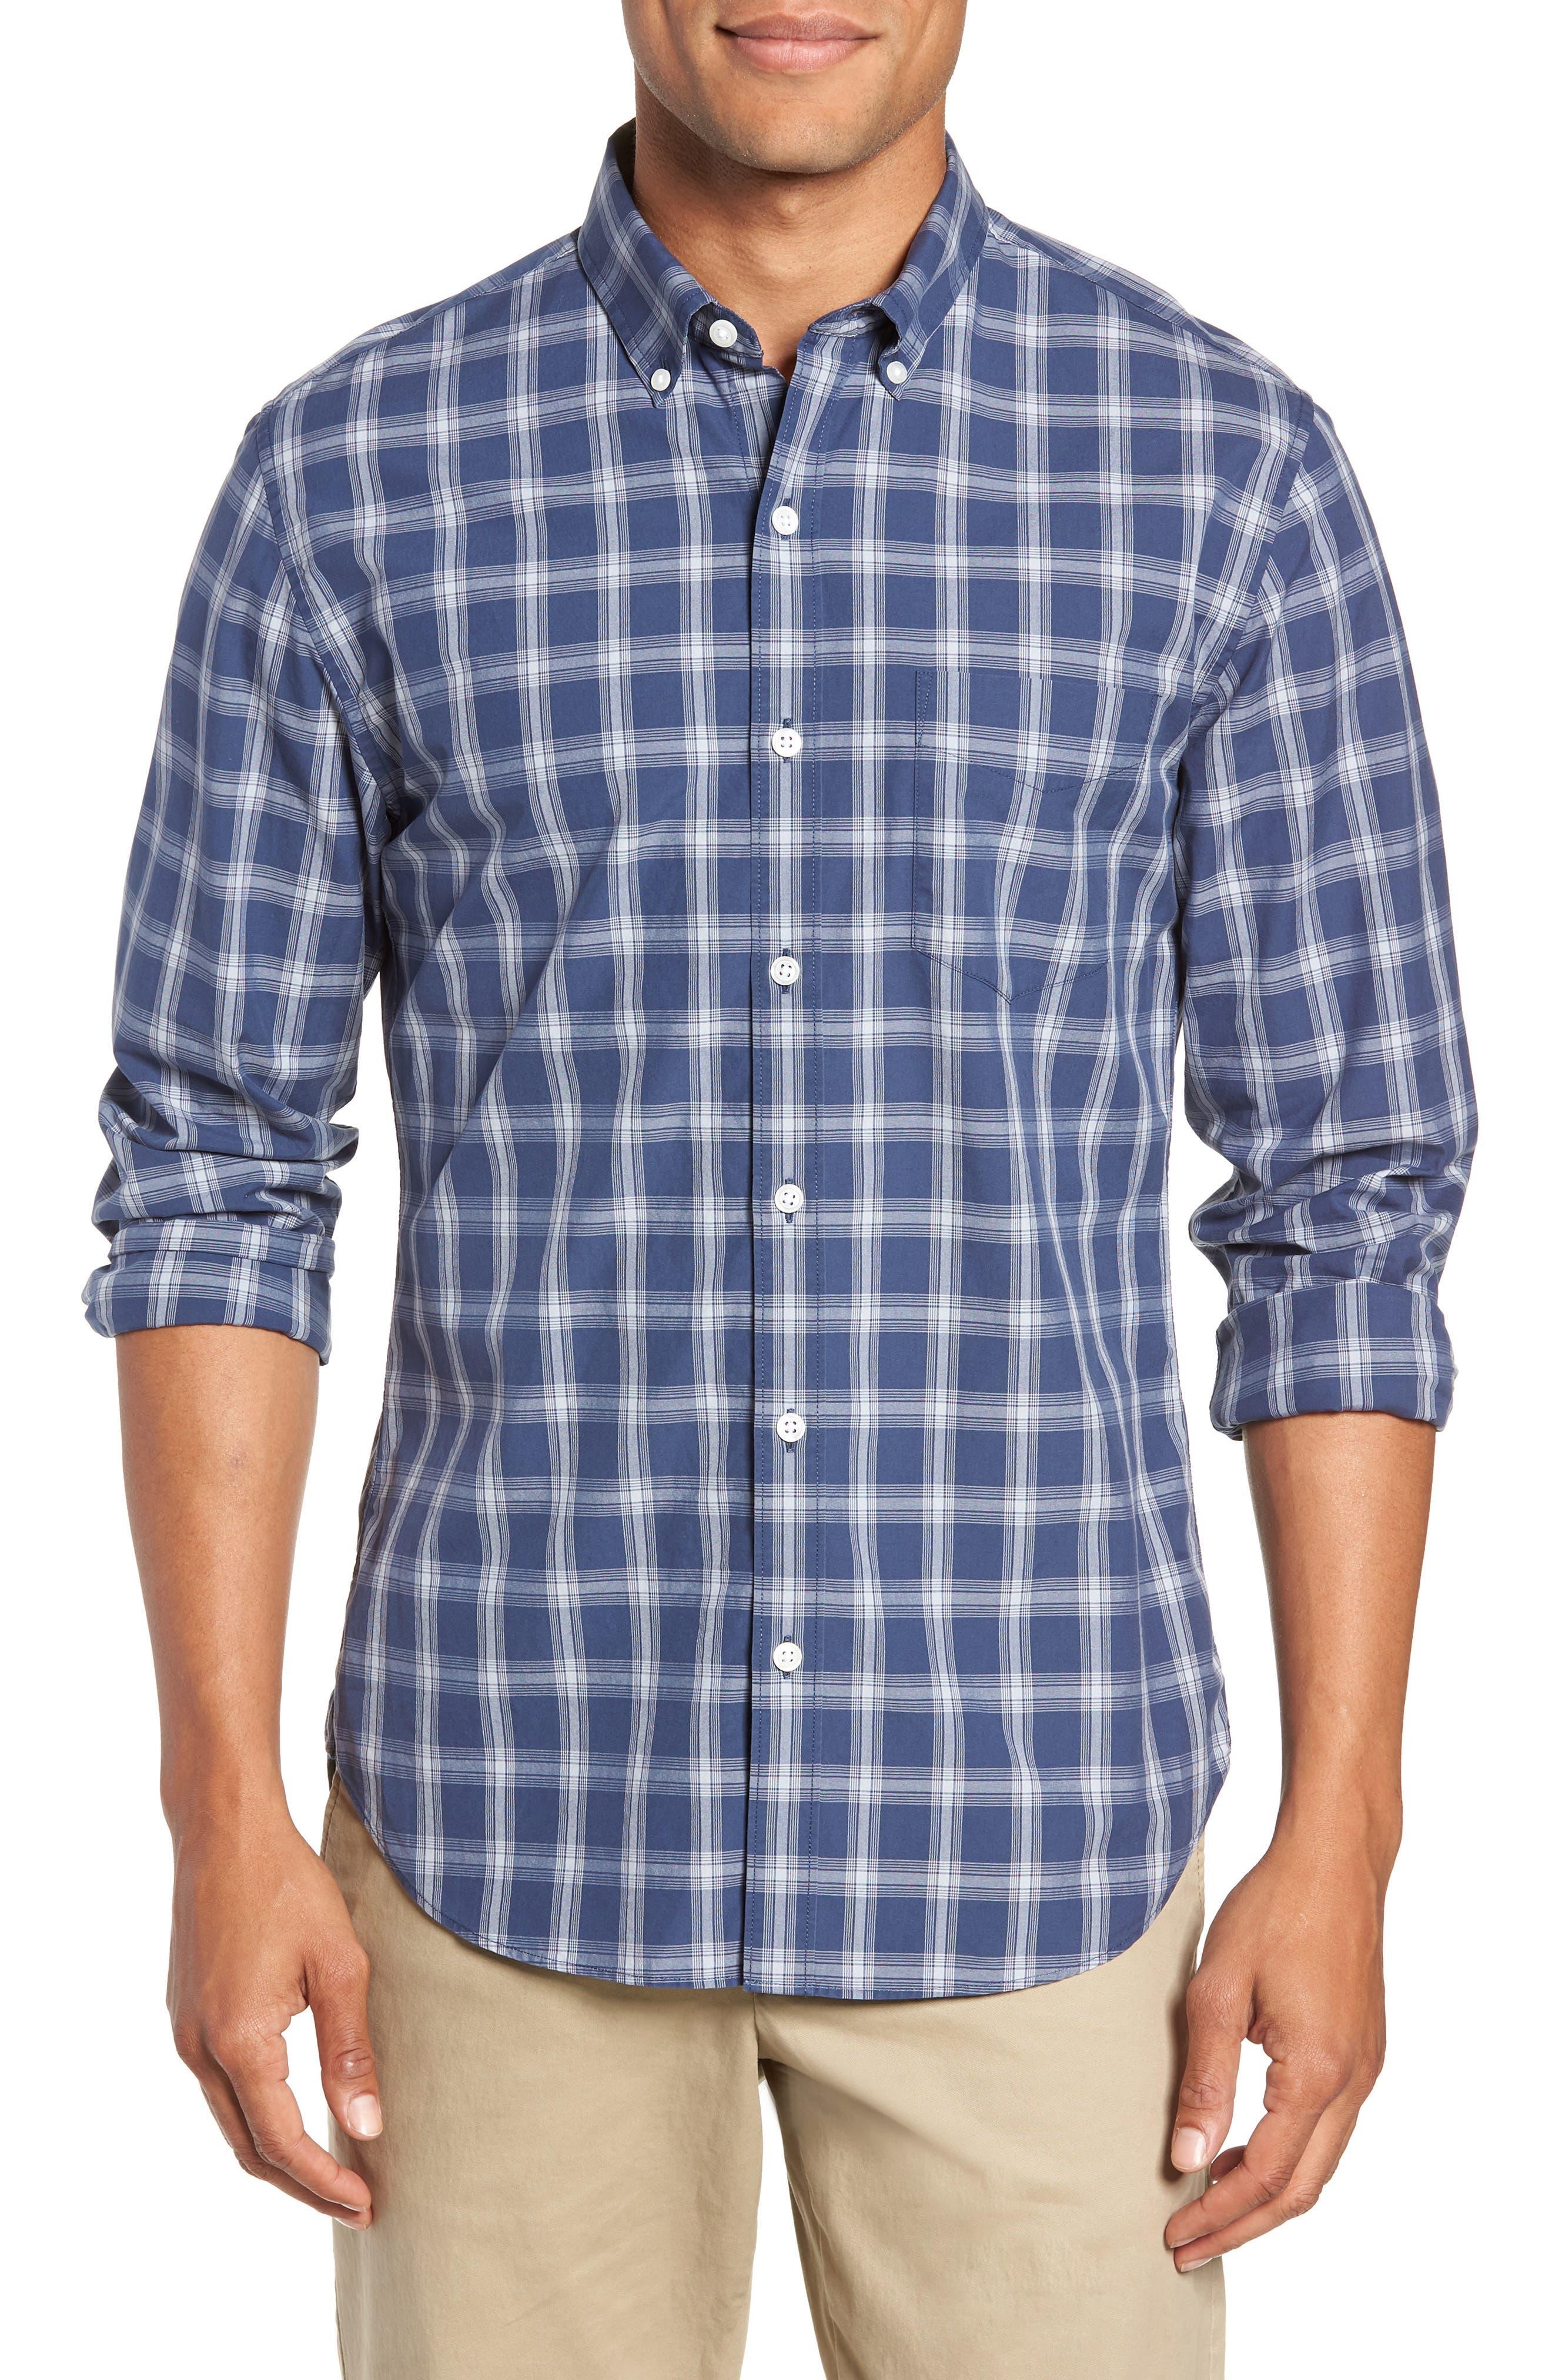 BONOBOS, Washed Button Down Slim Fit Plaid Sport Shirt, Main thumbnail 1, color, 400